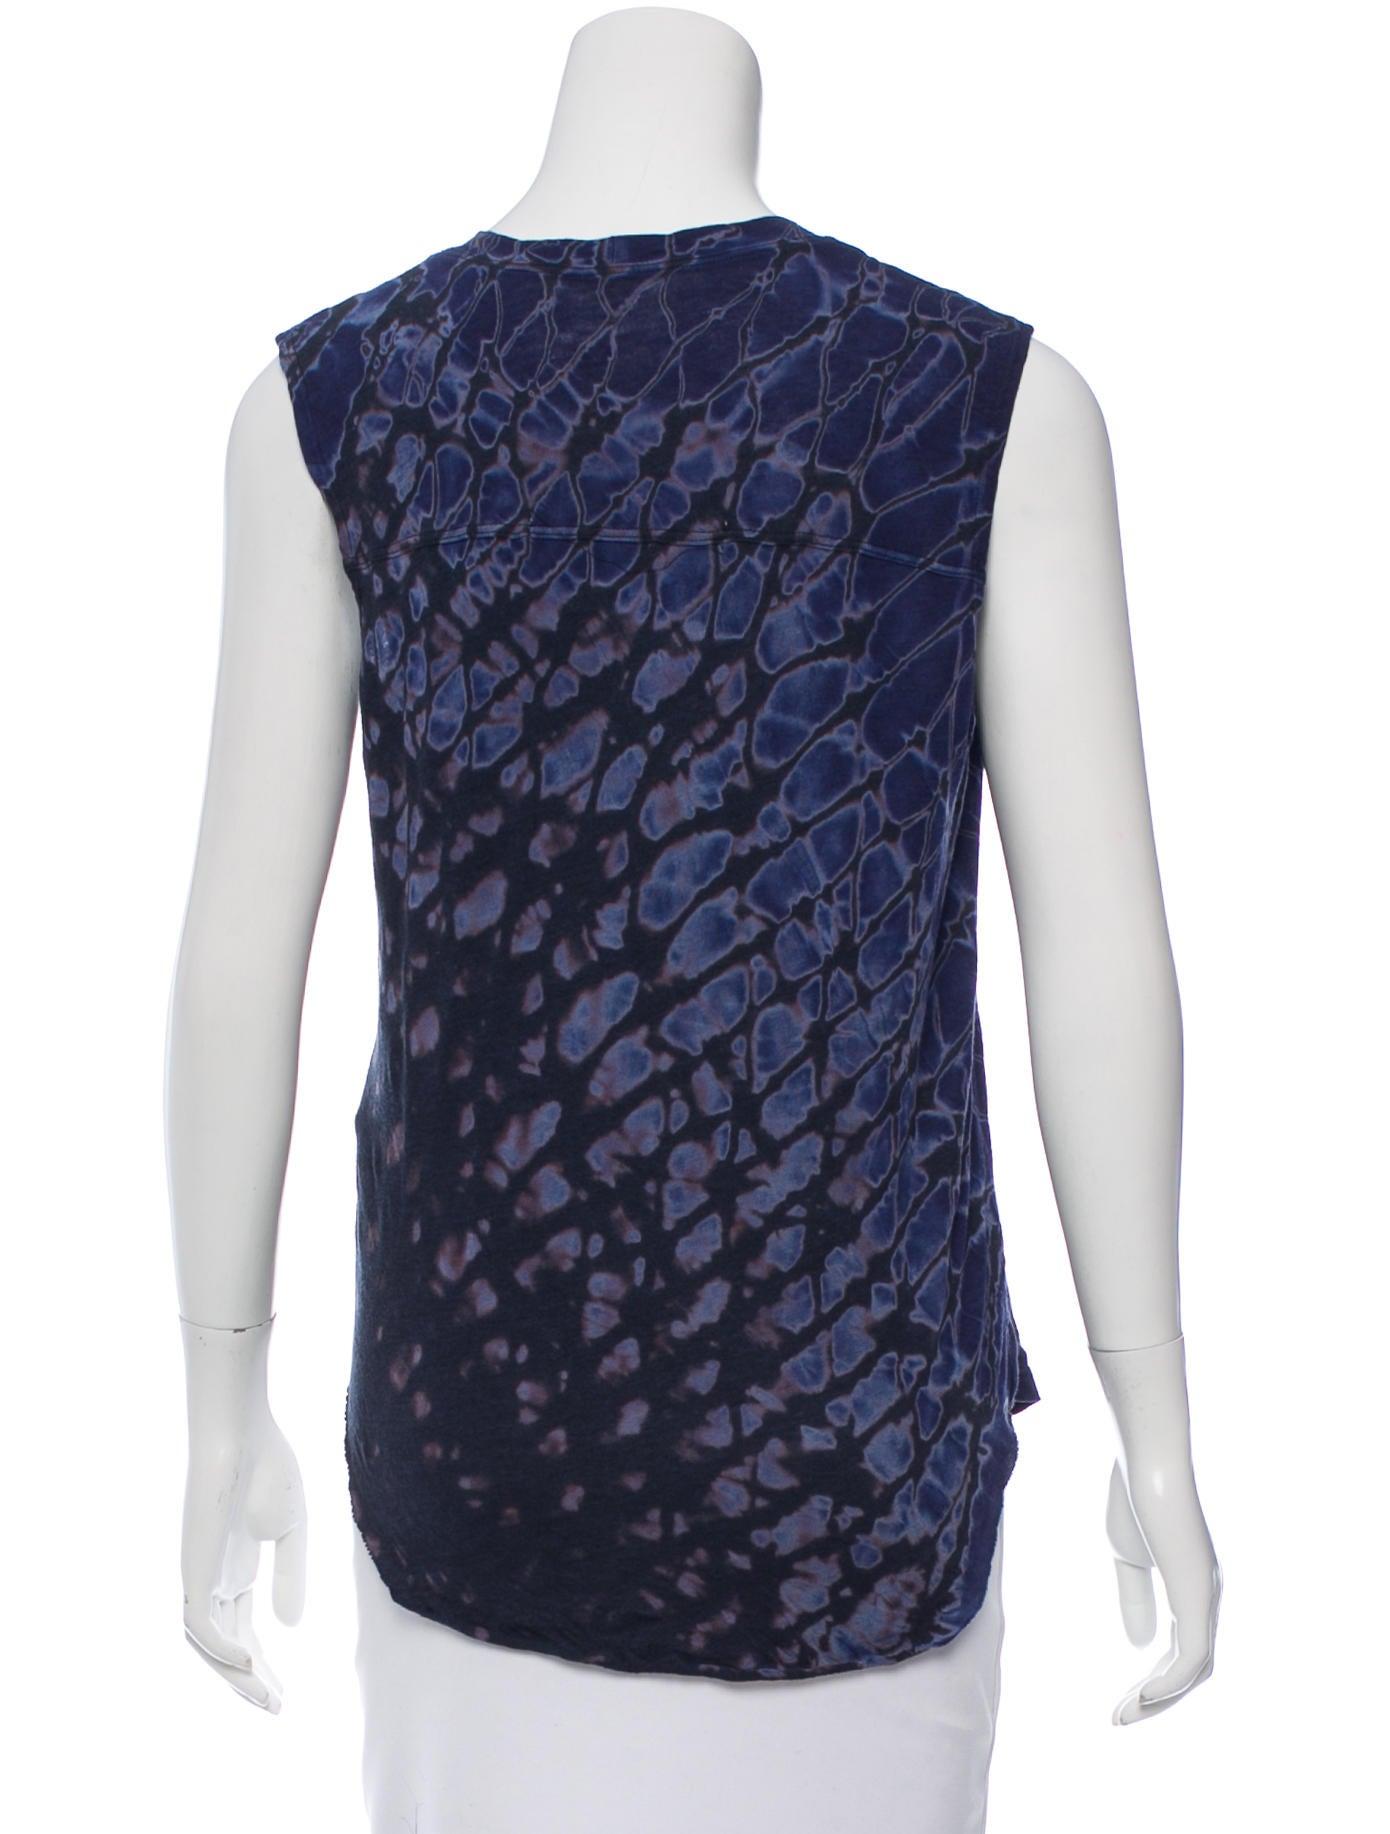 Raquel allegra sleeveless tie dye top w tags clothing for Tie dye sleeveless shirts